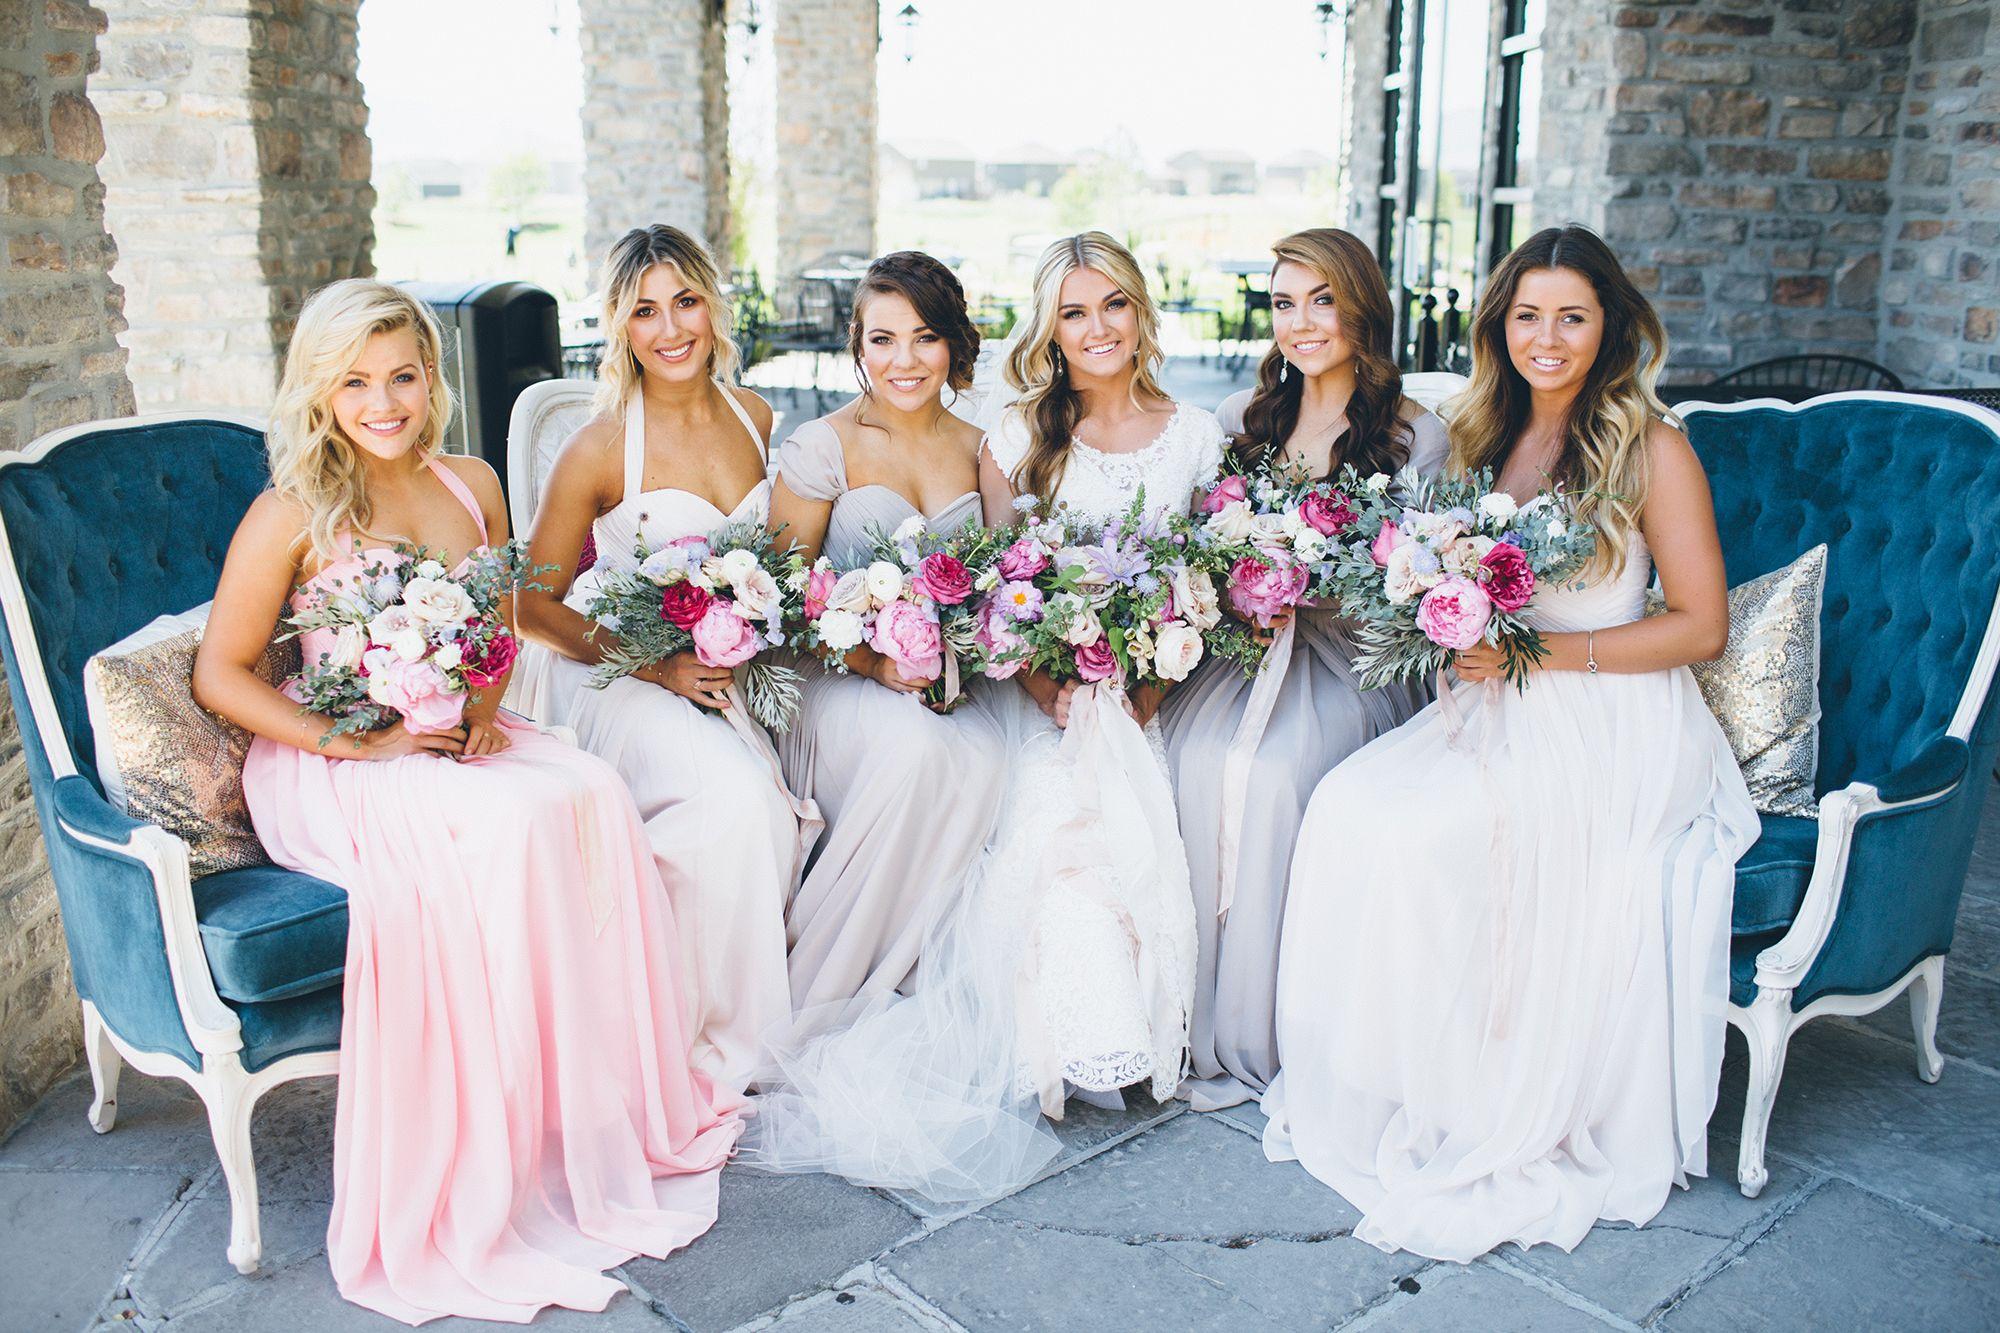 Lindsay schaub wedding